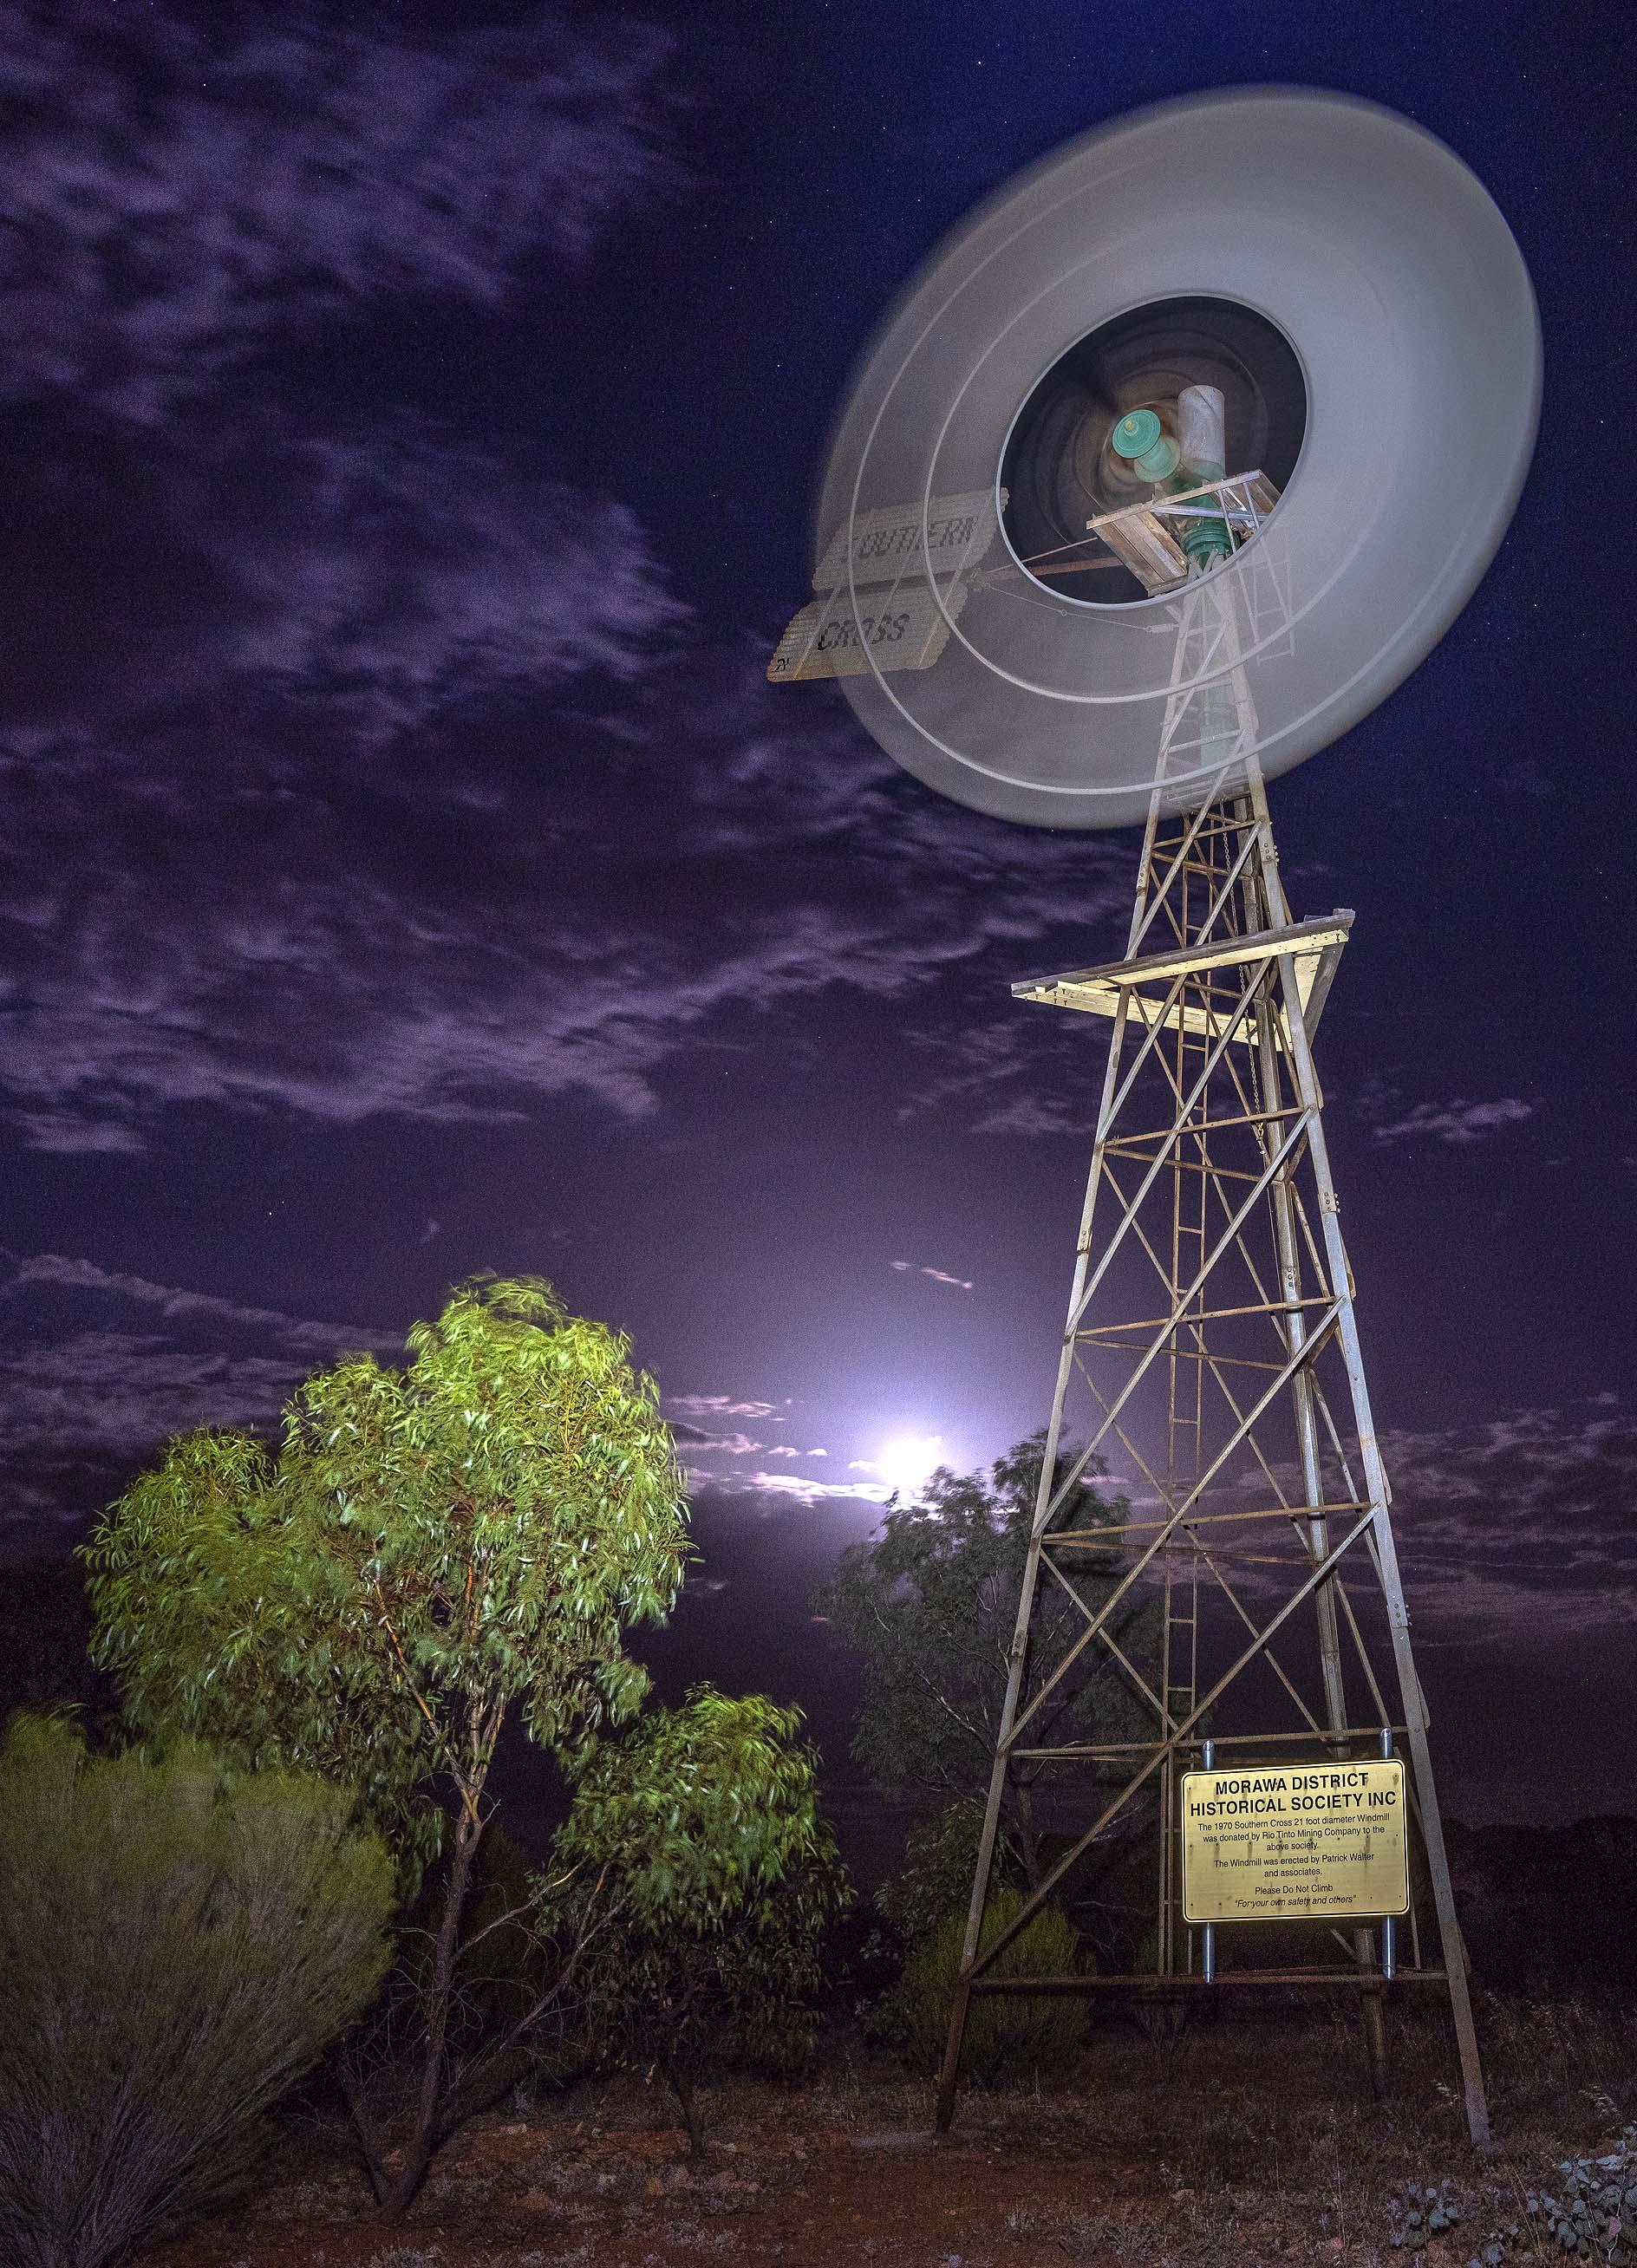 MOrawa Windmill _2826